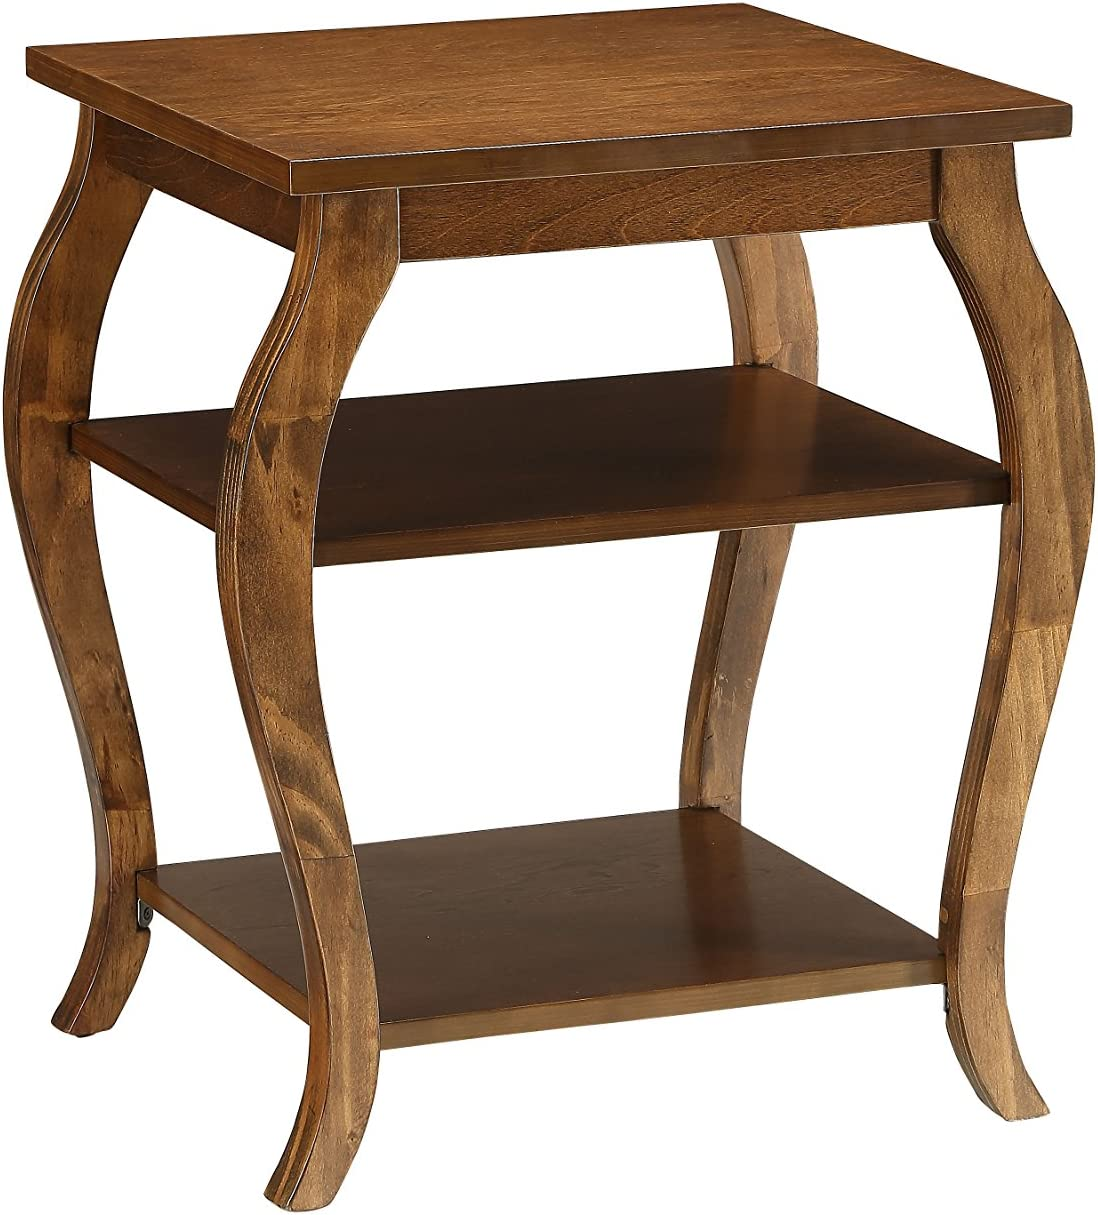 ACME Becci End Table - 82830 - Walnut